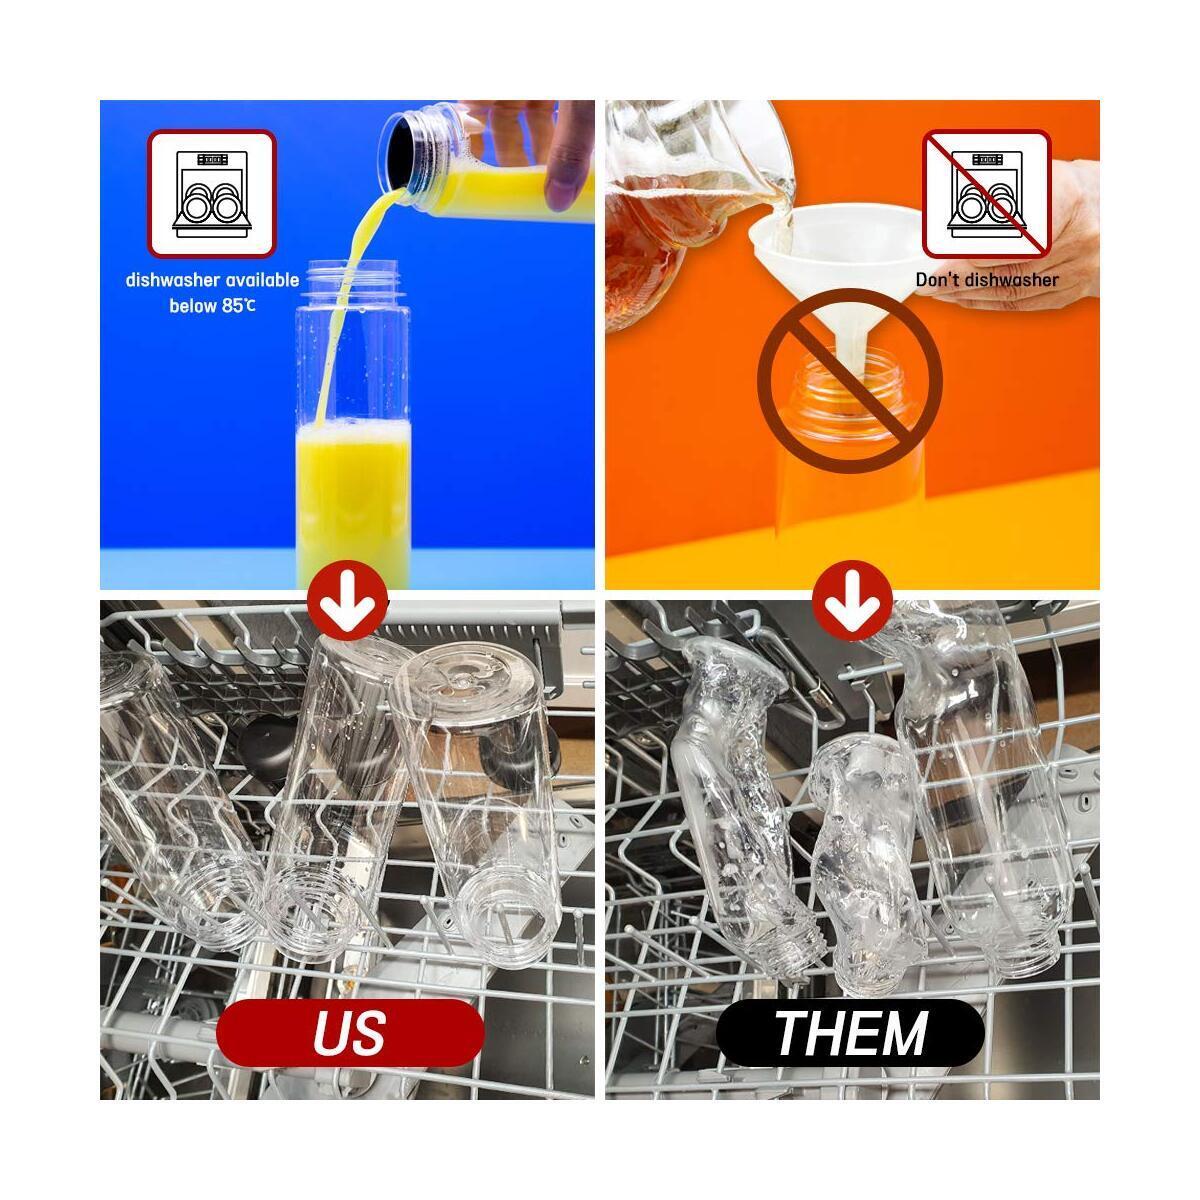 12STAIR 10pcs PET Plastic Juice Bottles 16oz Plastic Bottles with caps Drink Container Smoothie Bottle Dishwasher Safe Food Grade BPA Free Milk and Other Beverages